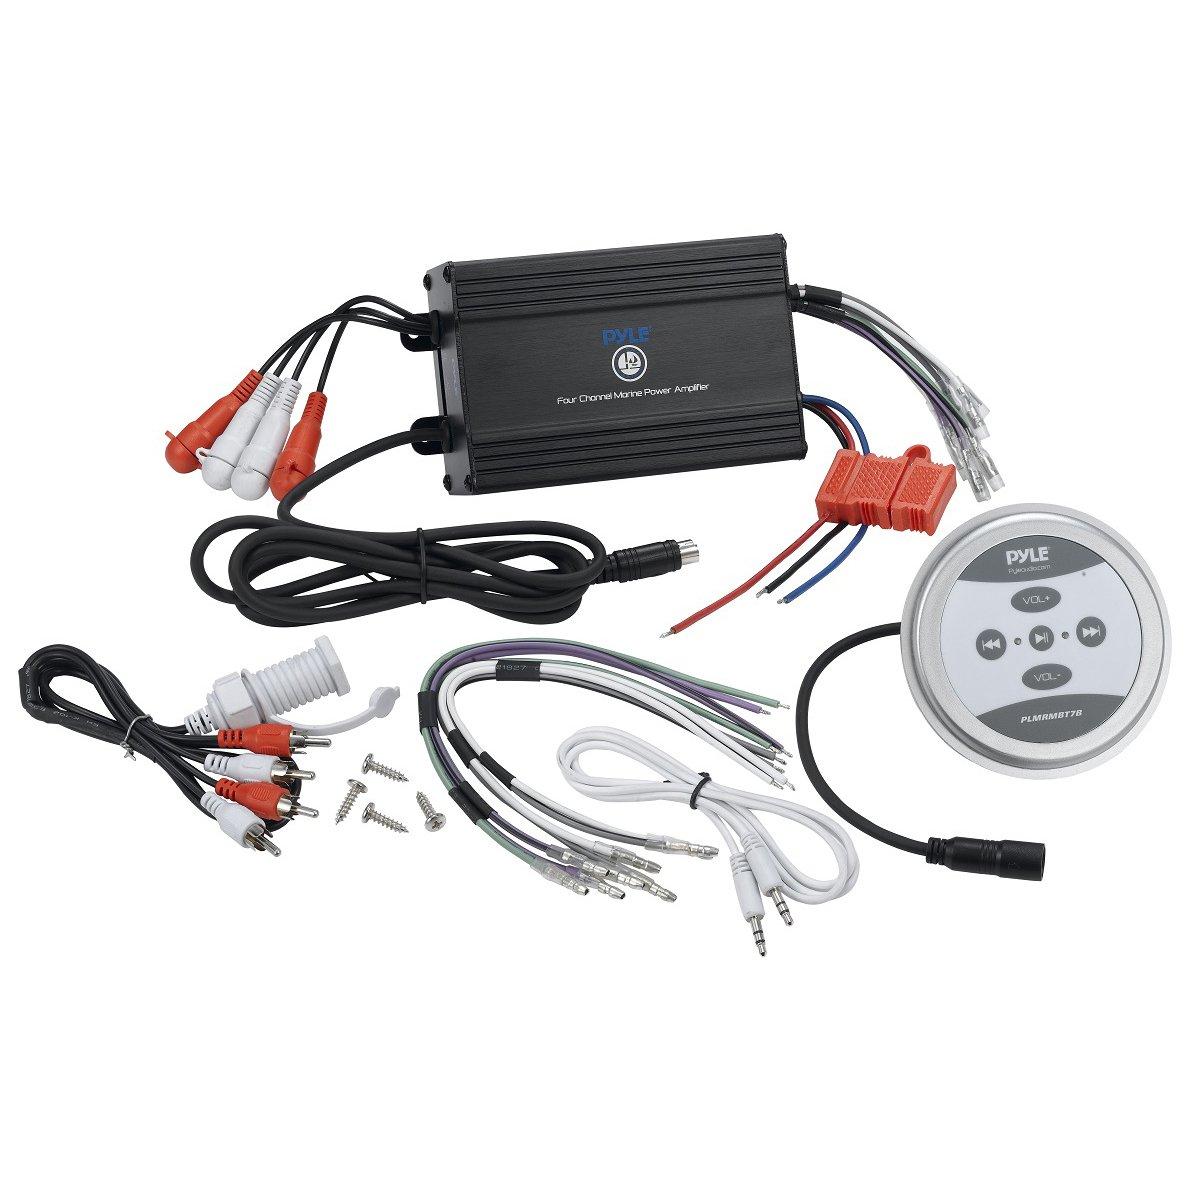 Pyle Compact Bluetooth Marine Amplifier Kit - Waterproof Rated 4-Channel Audio Amp | Wireless Music Streaming | AUX/RCA/MP3 Input | Speaker Wiring | 1200 Watt MAX (PLMRMBT7B)